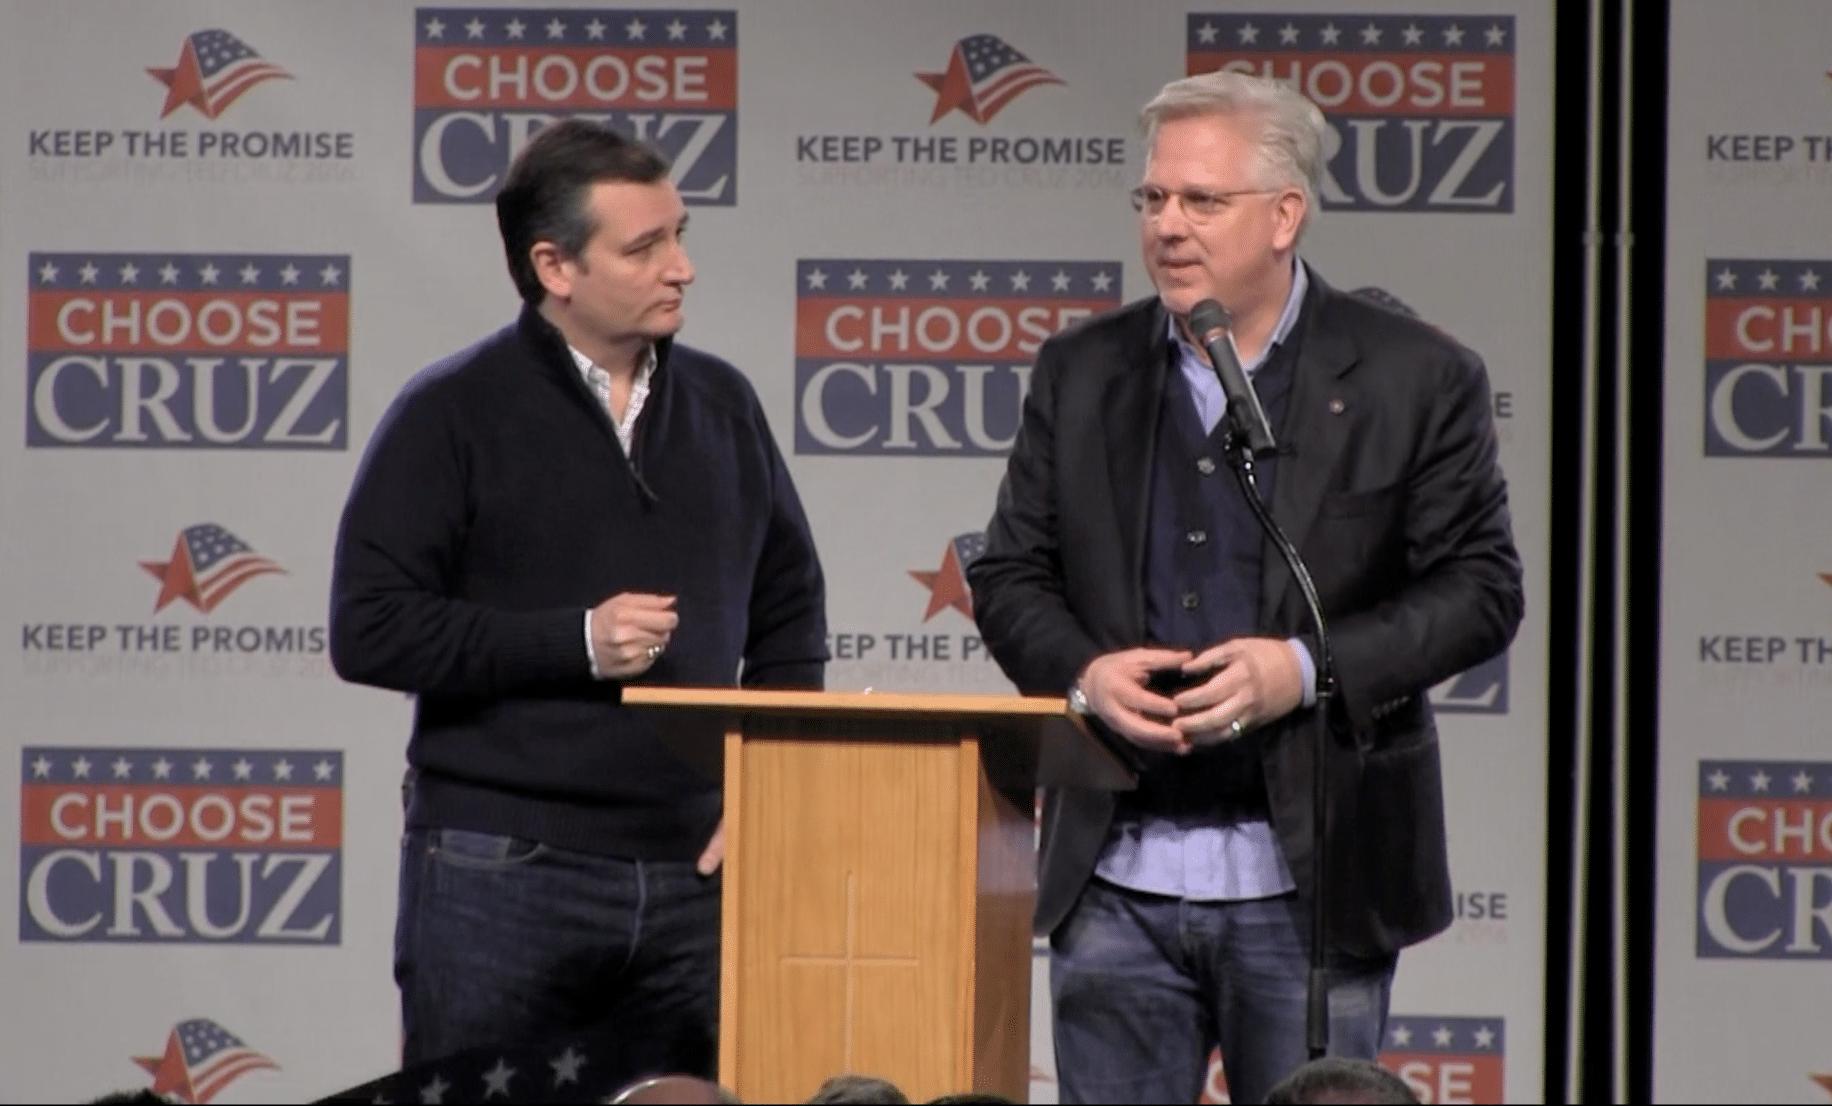 U.S. Senator Ted Cruz (R-TX) joins Glenn Beck on stage at a rally in Ankeny, IA.